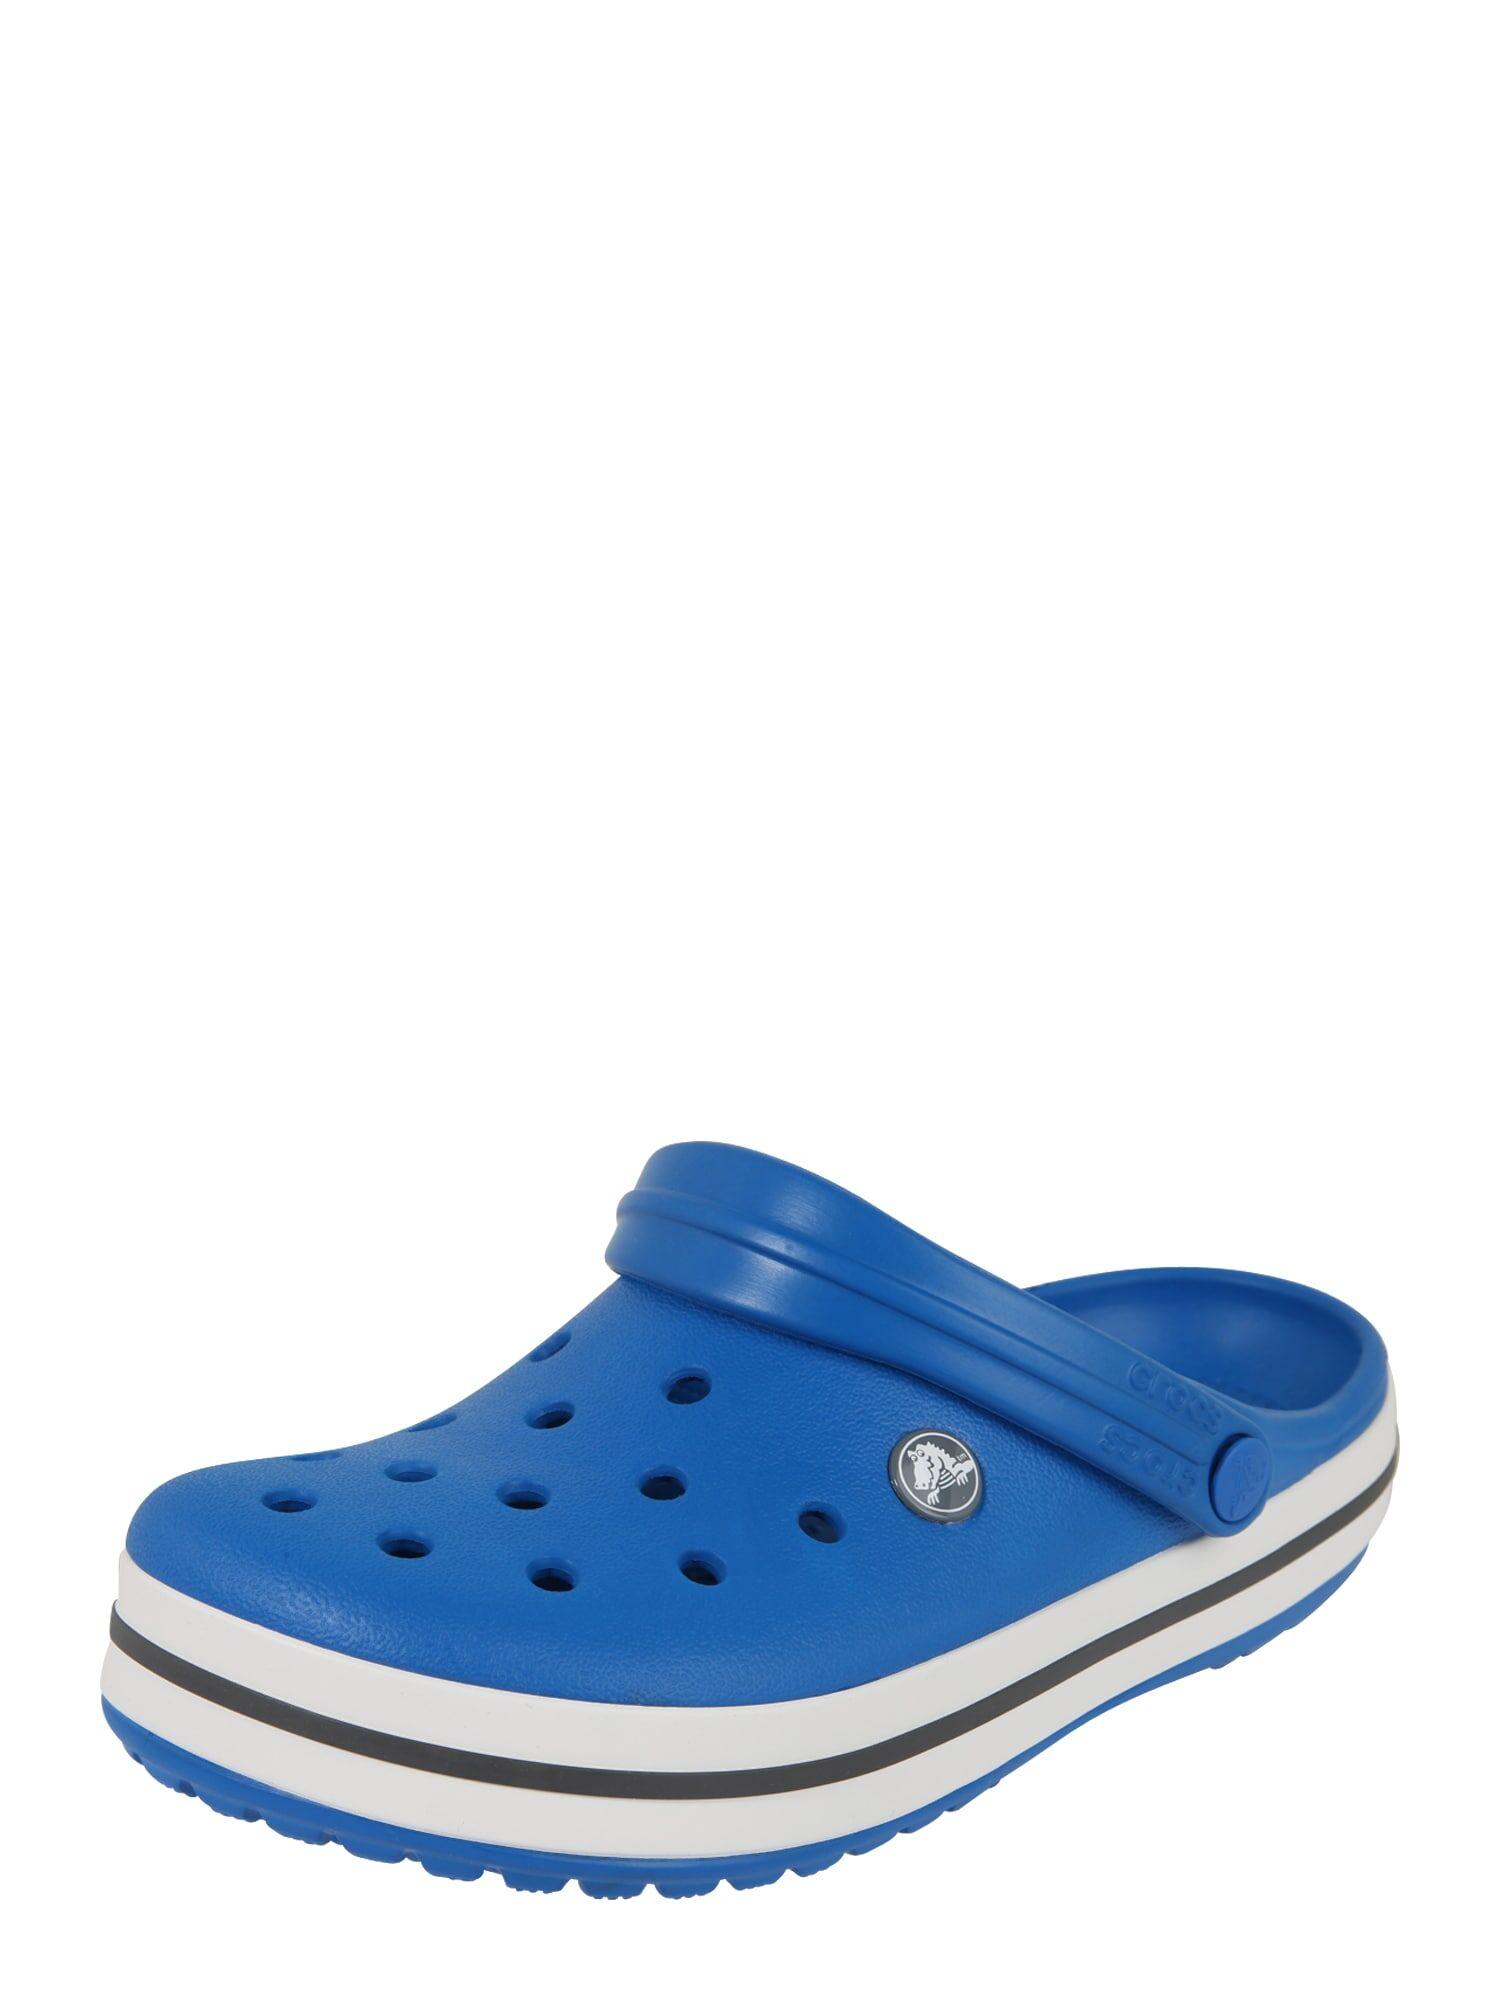 Crocs Sabots 'Crocband'  - Bleu - Taille: M7W9 - male